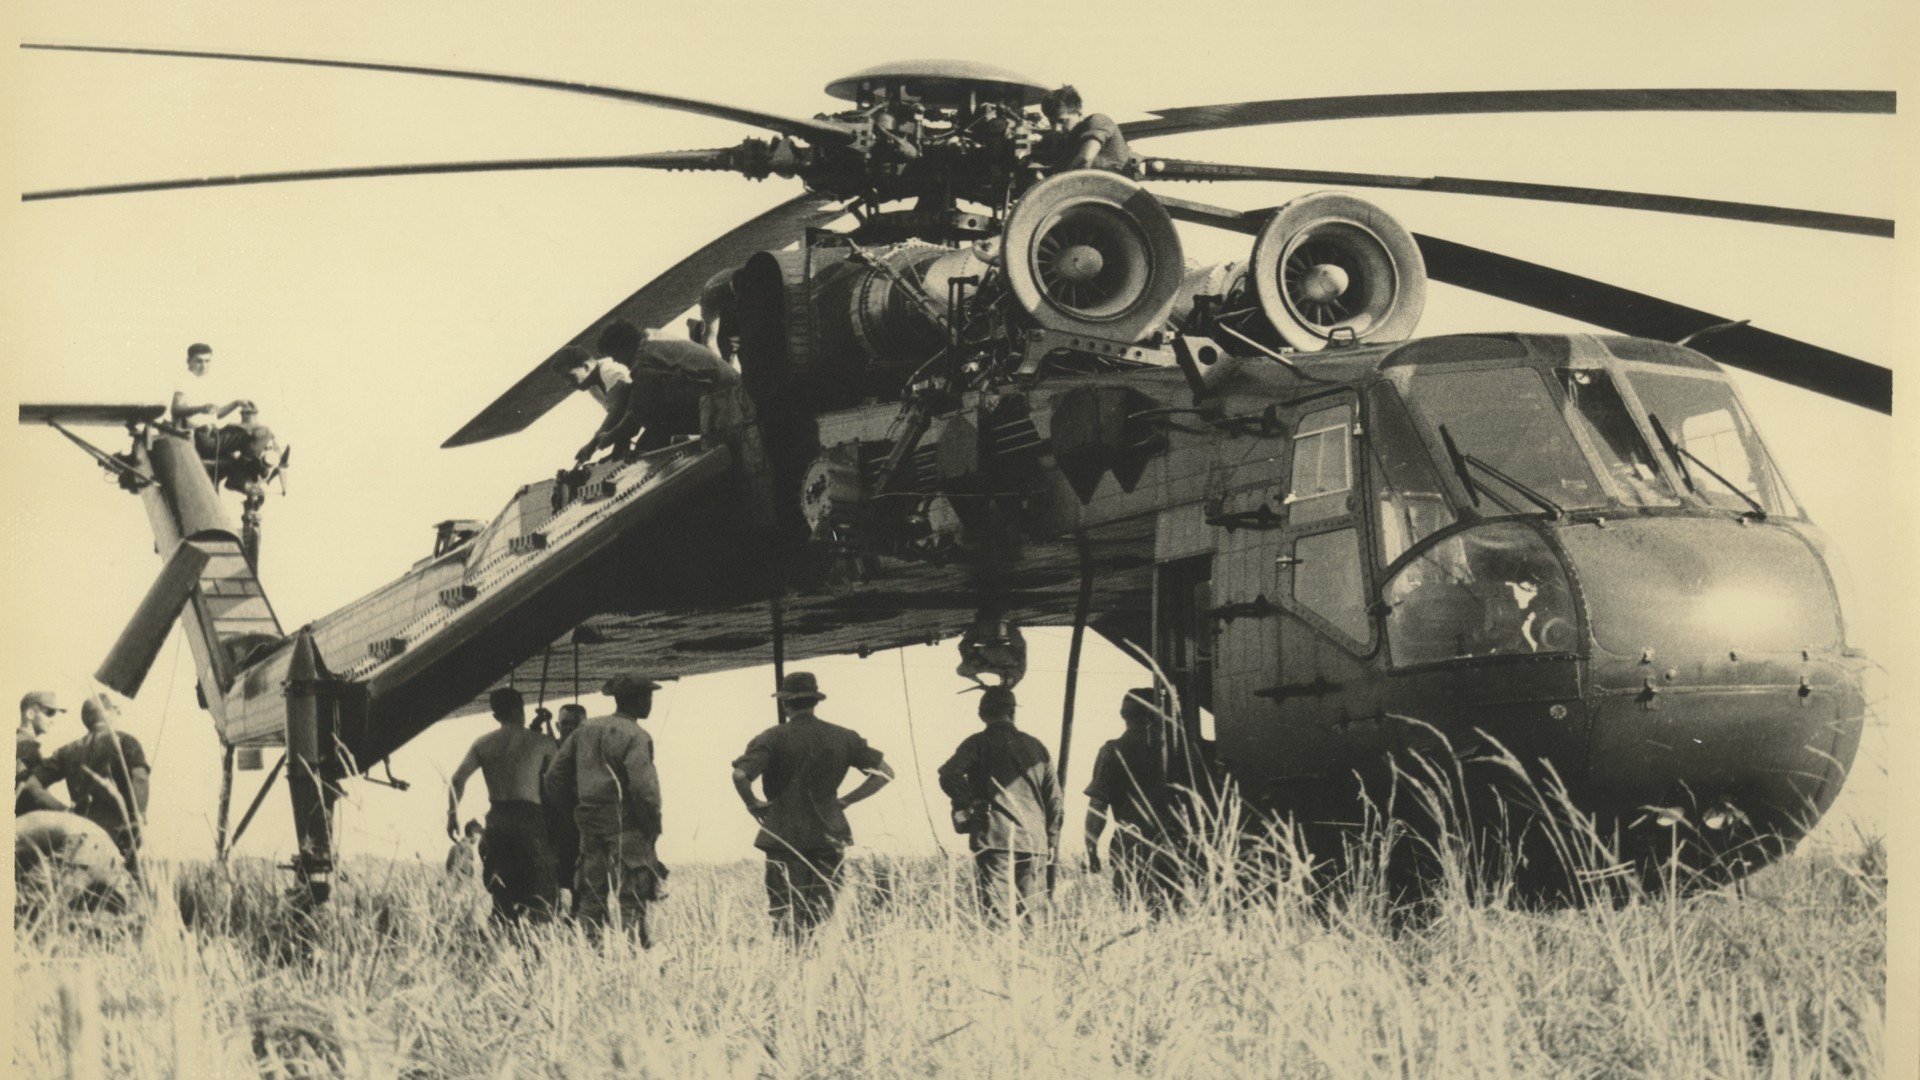 File Vietnam War Wallpapers ATHXF6Vjpg   4USkY 1920x1080